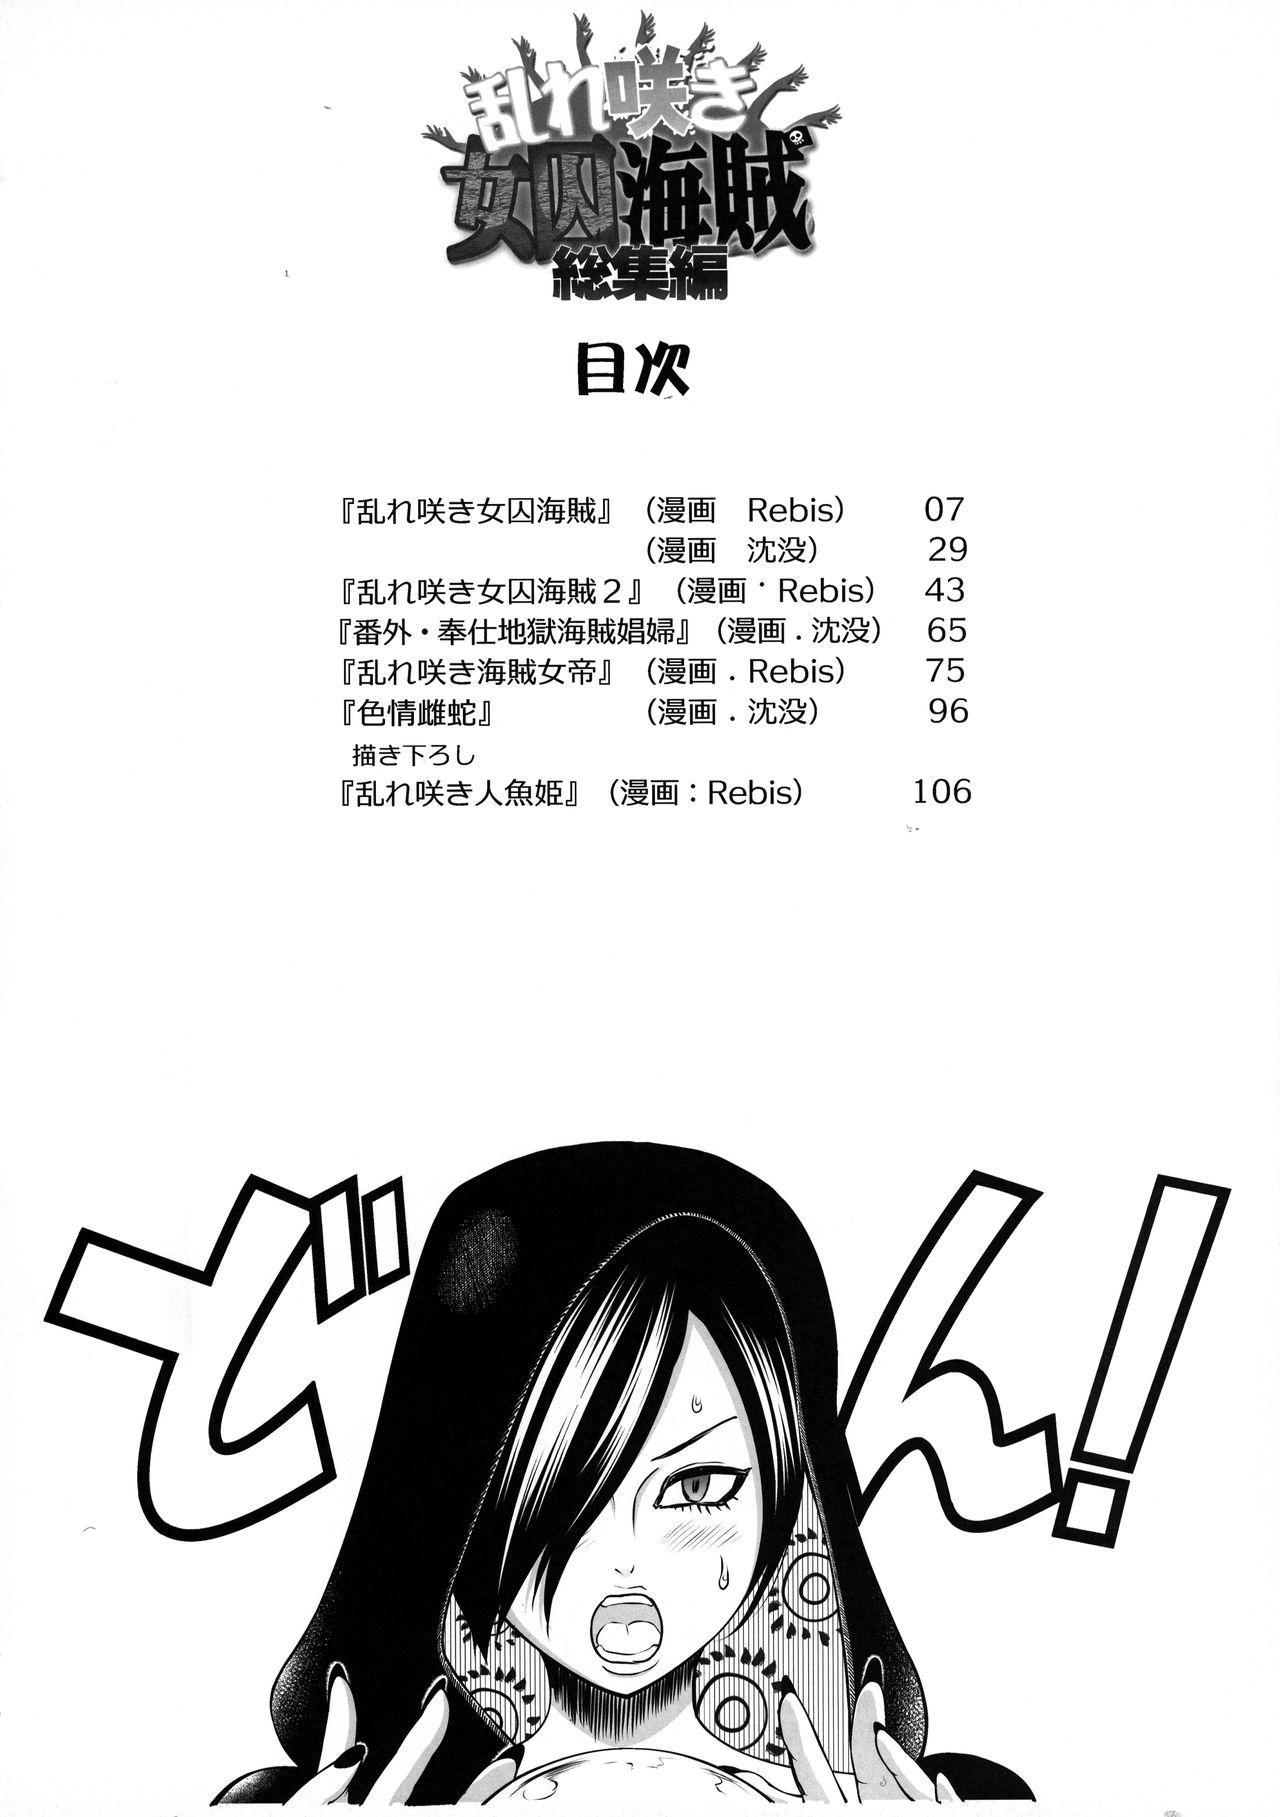 Midare Saki Joshuu Kaizoku Soushuuhen   Bloom, Pirate Hooker! Bloom! Annual 5